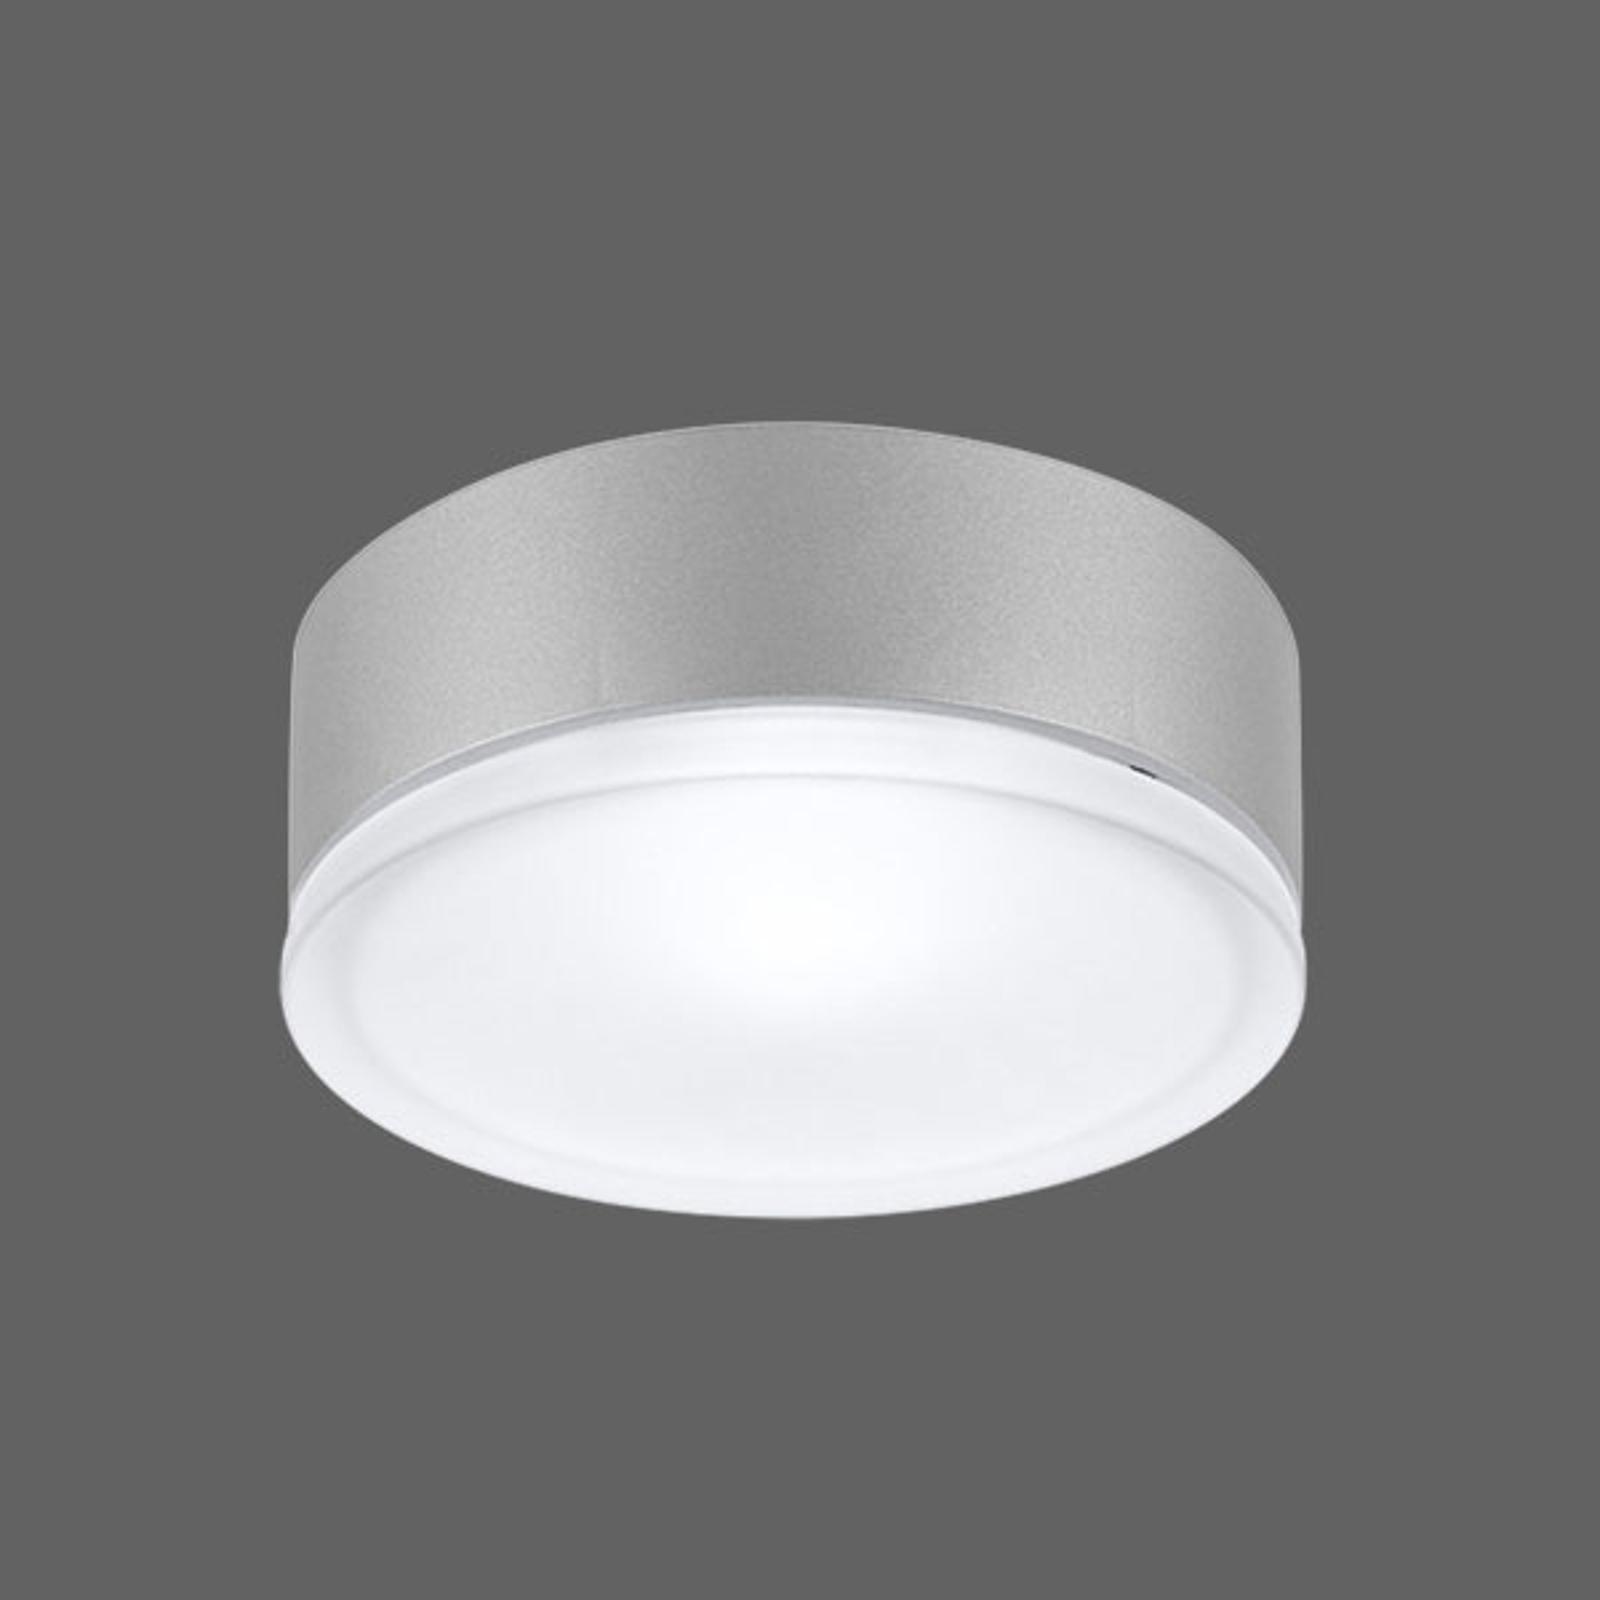 Effektiv vegglampe Drop 22 LED grå 4000K